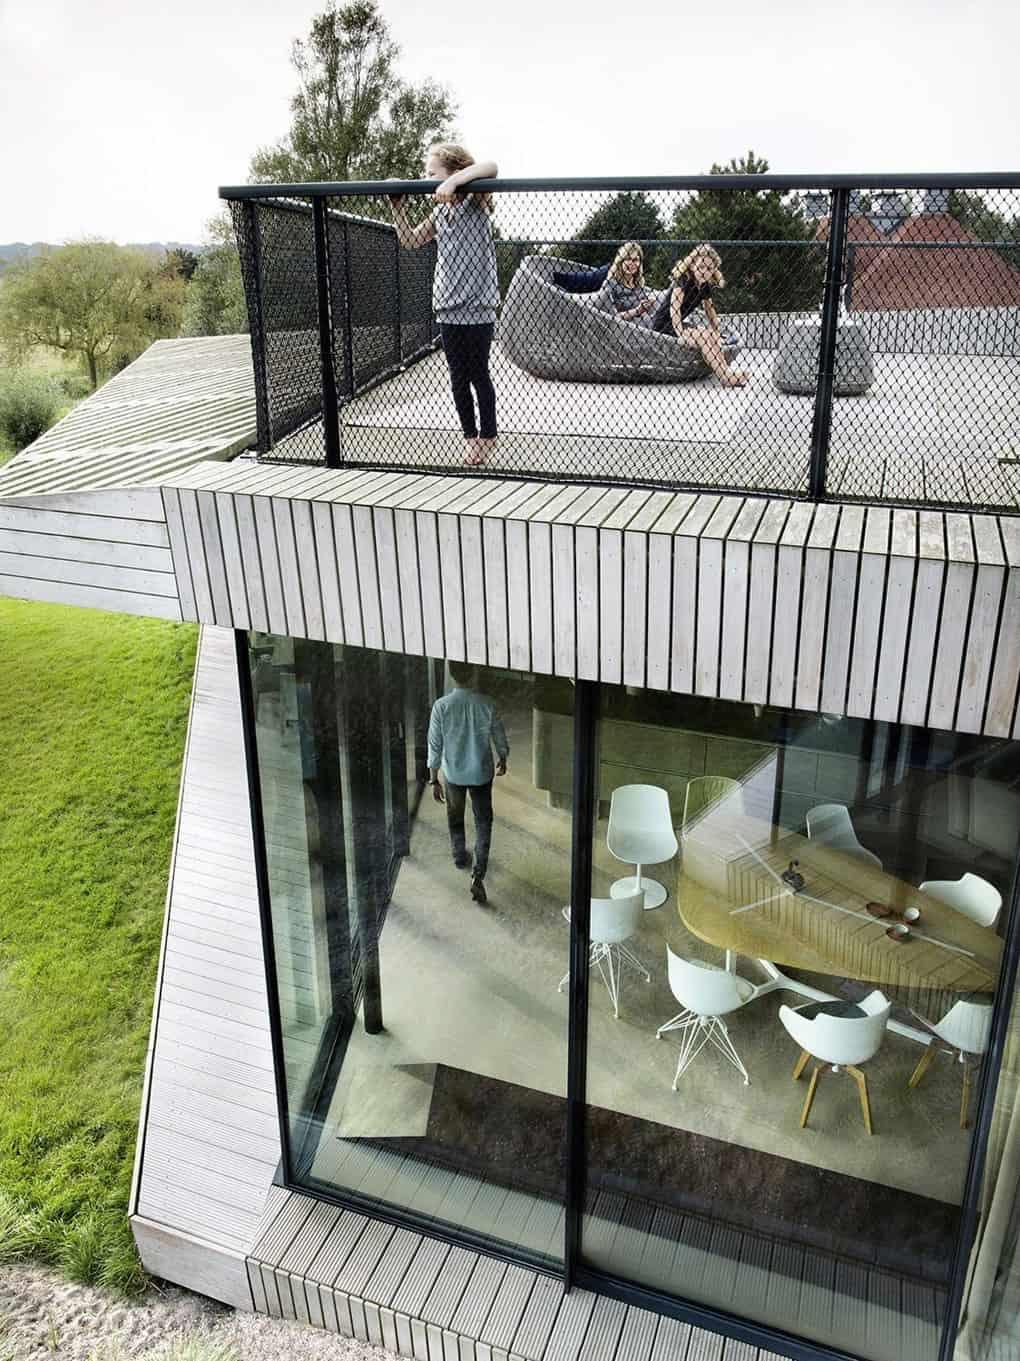 The W.I.N.D. House by UN Studio (5)